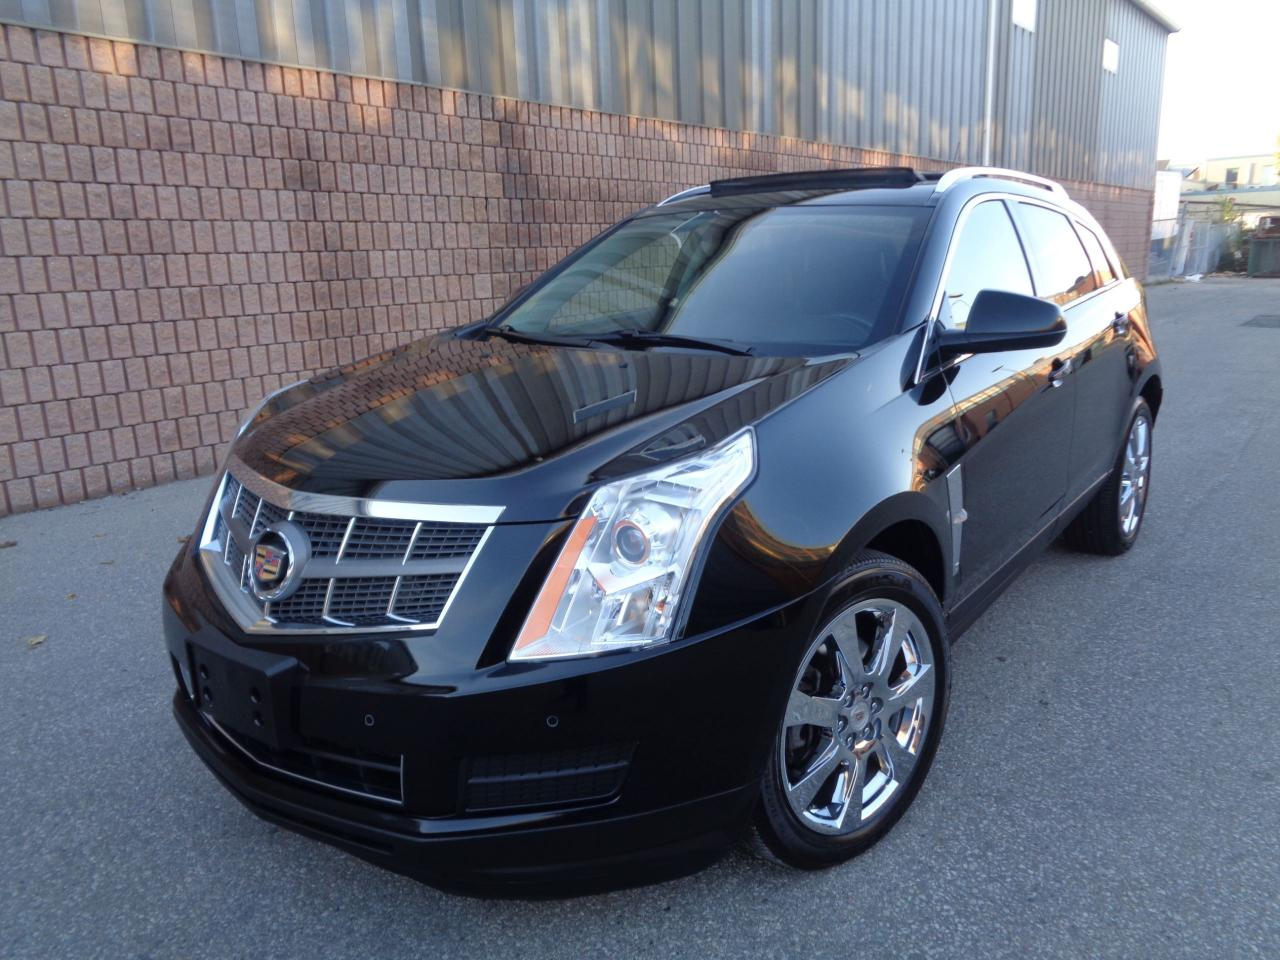 Photo of Black 2011 Cadillac SRX